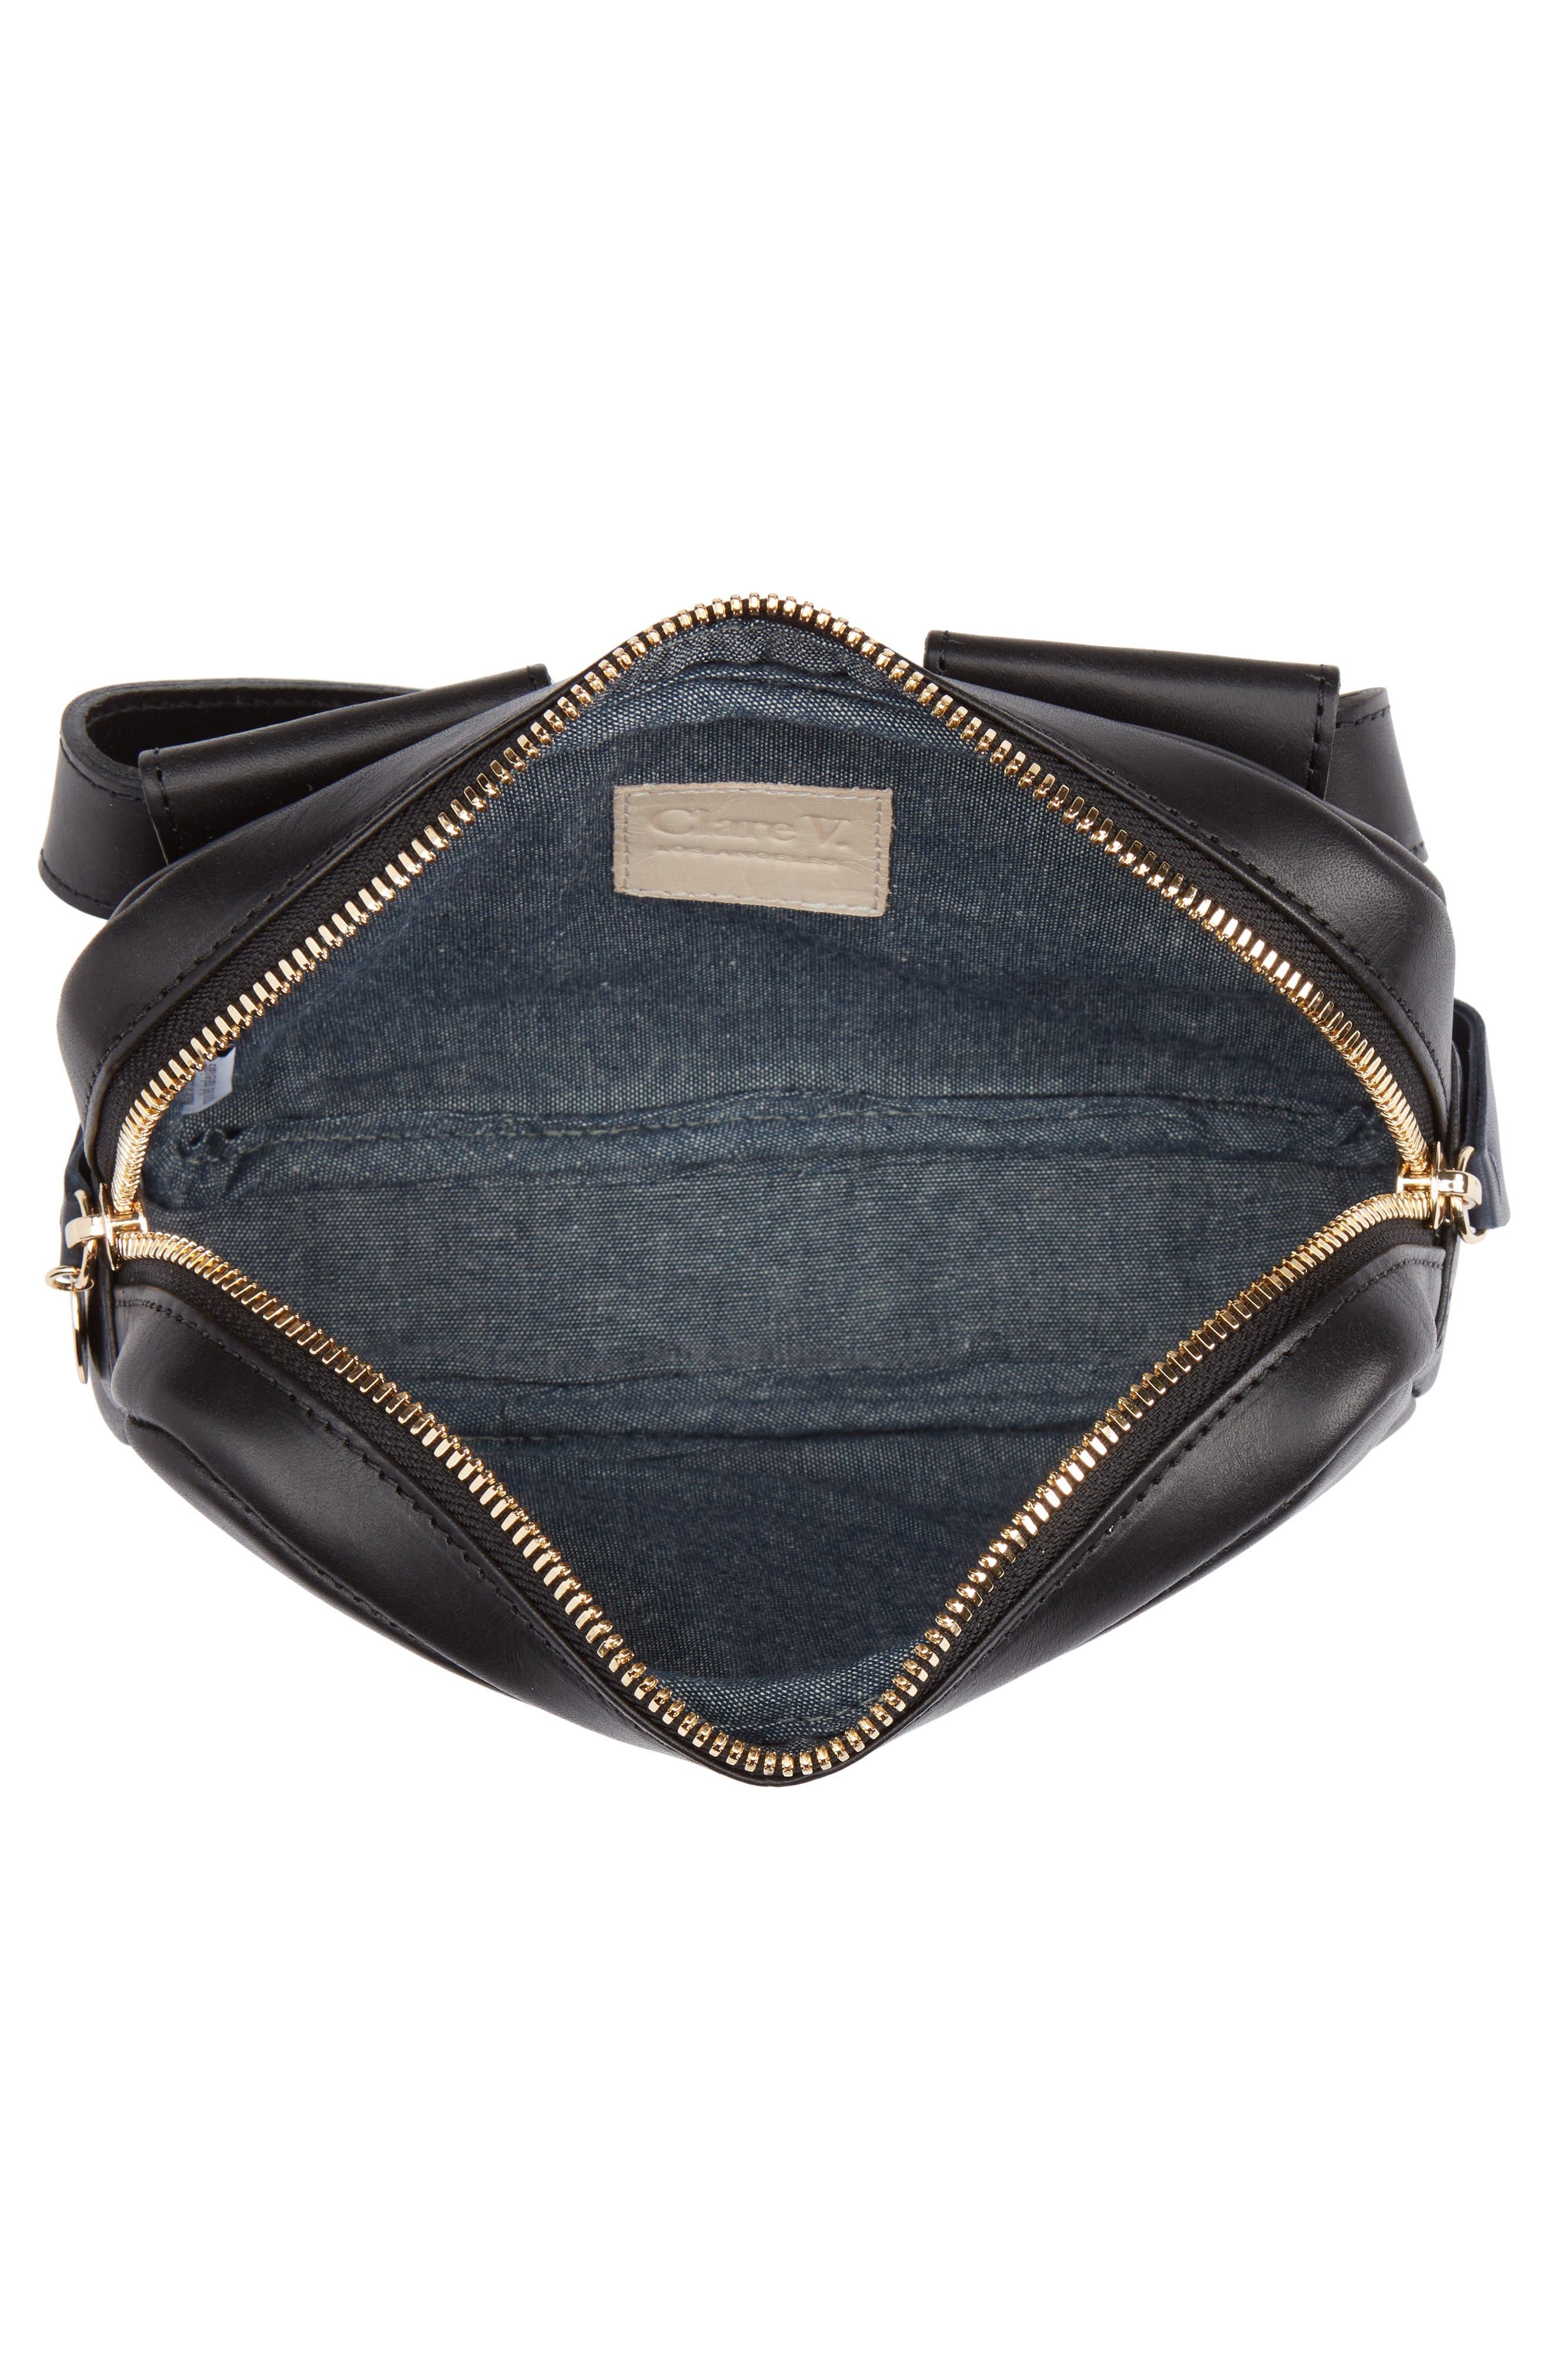 Le Belt Leather Convertible Crossbody Bag,                             Alternate thumbnail 5, color,                             BLACK VEGAN